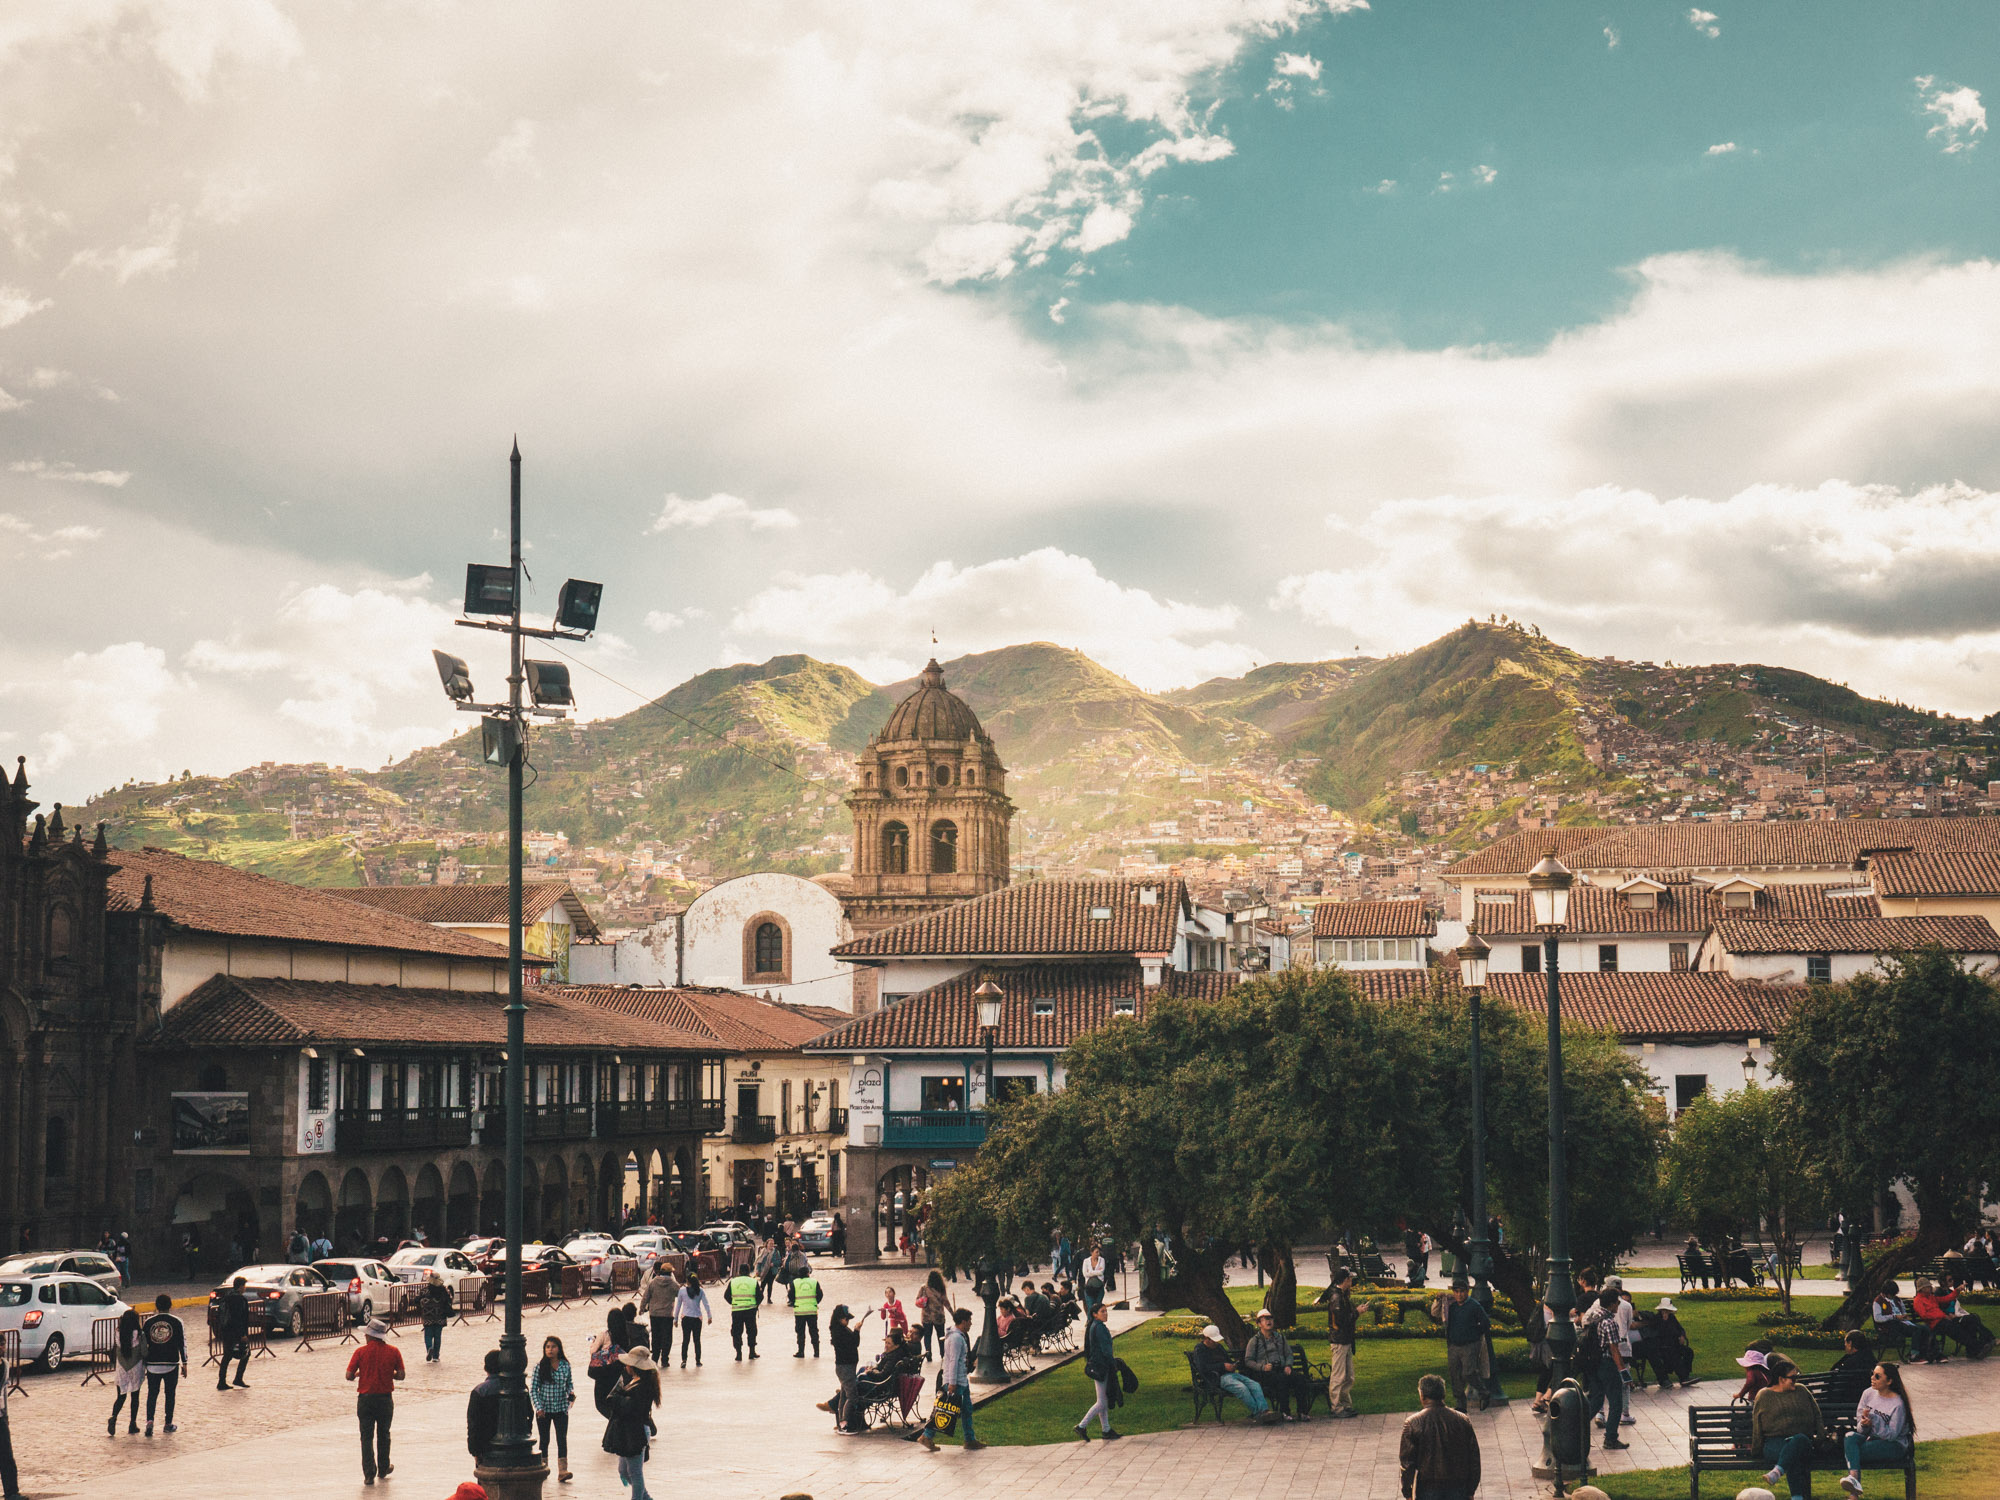 Plaza de Armes, the central square